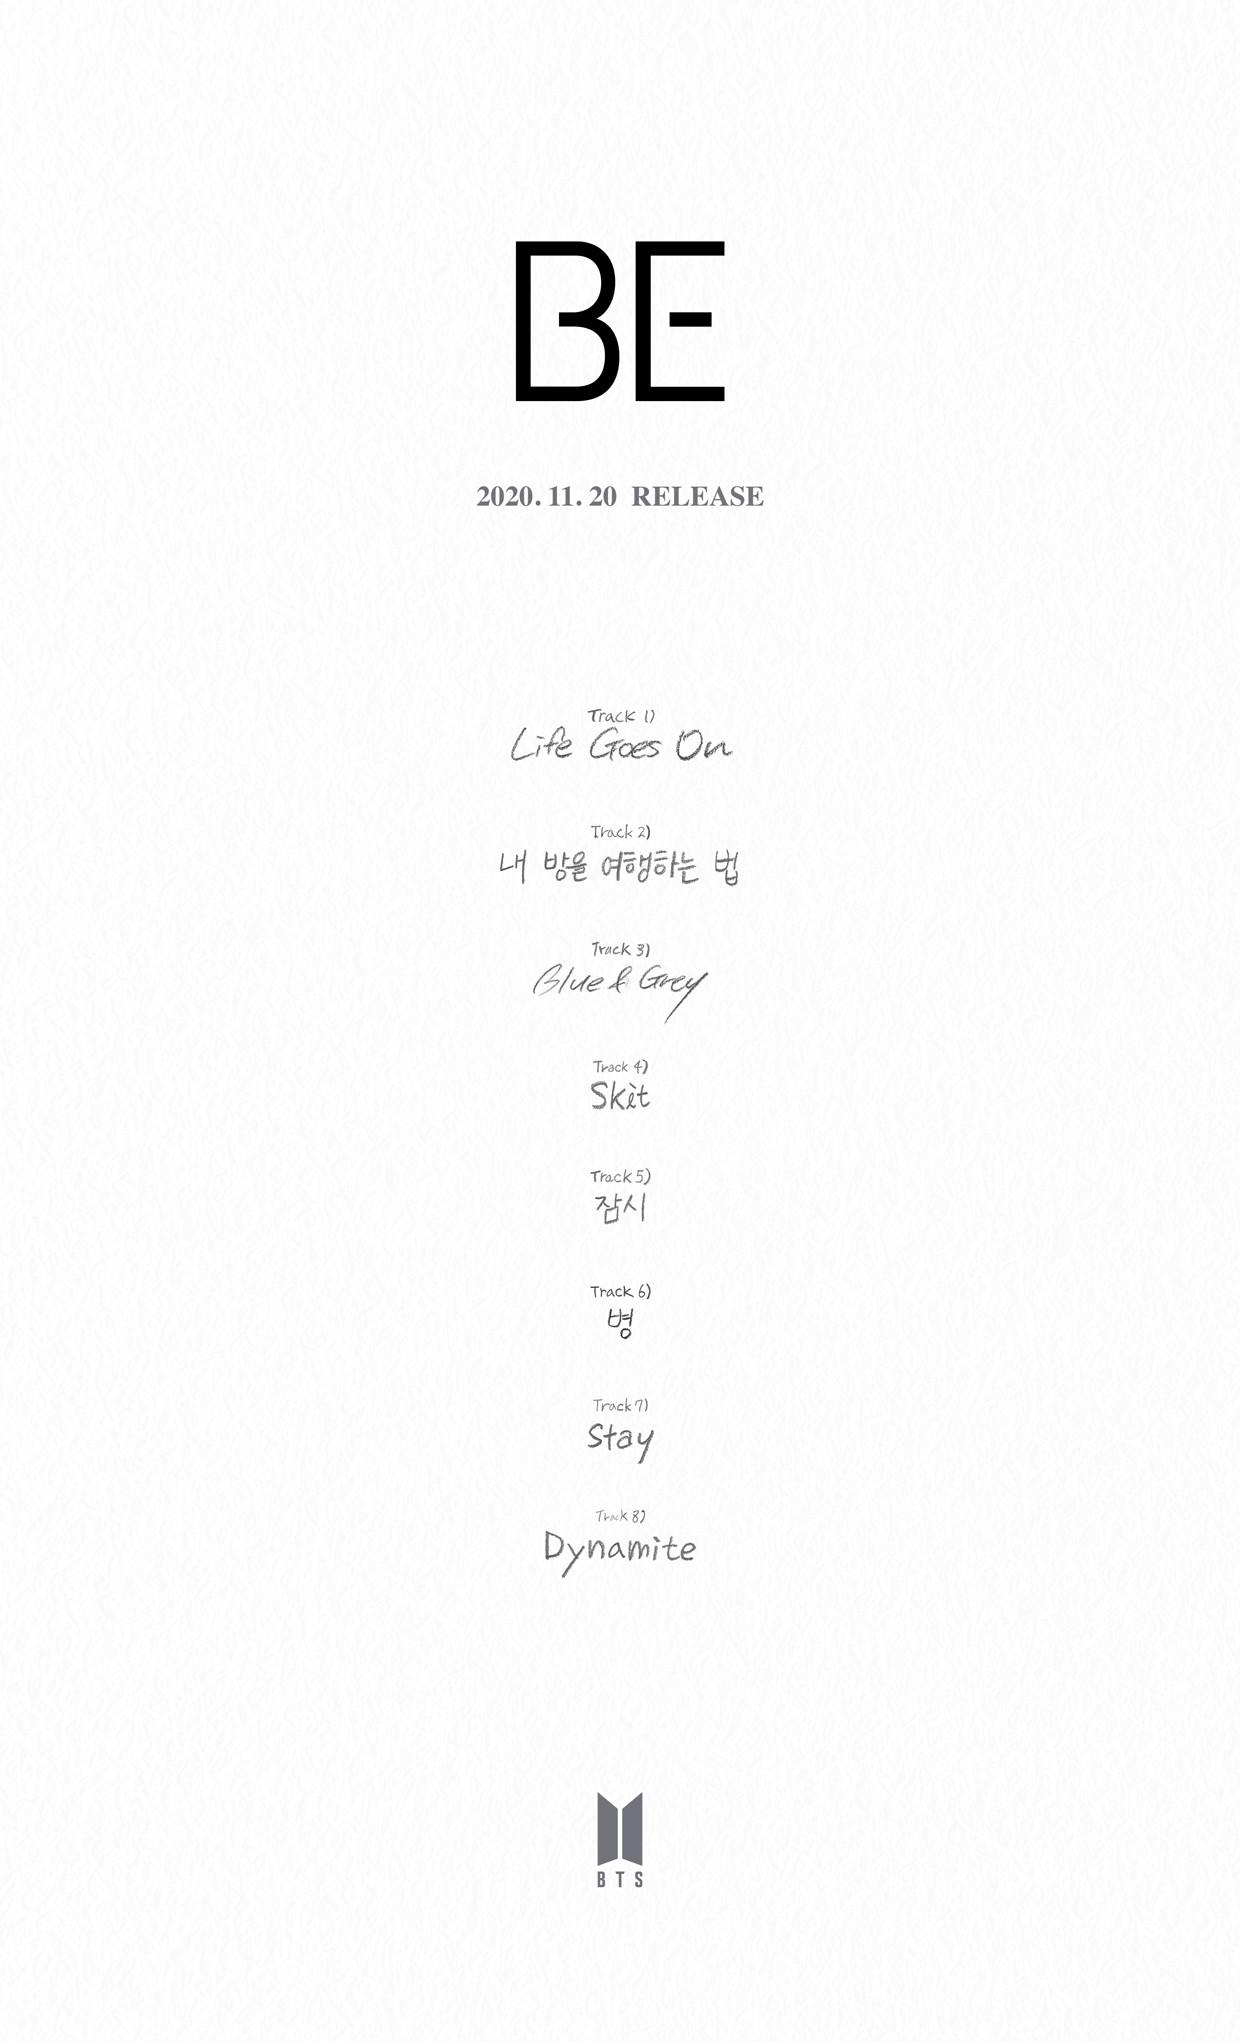 BTS 'BE' Album Tracklist